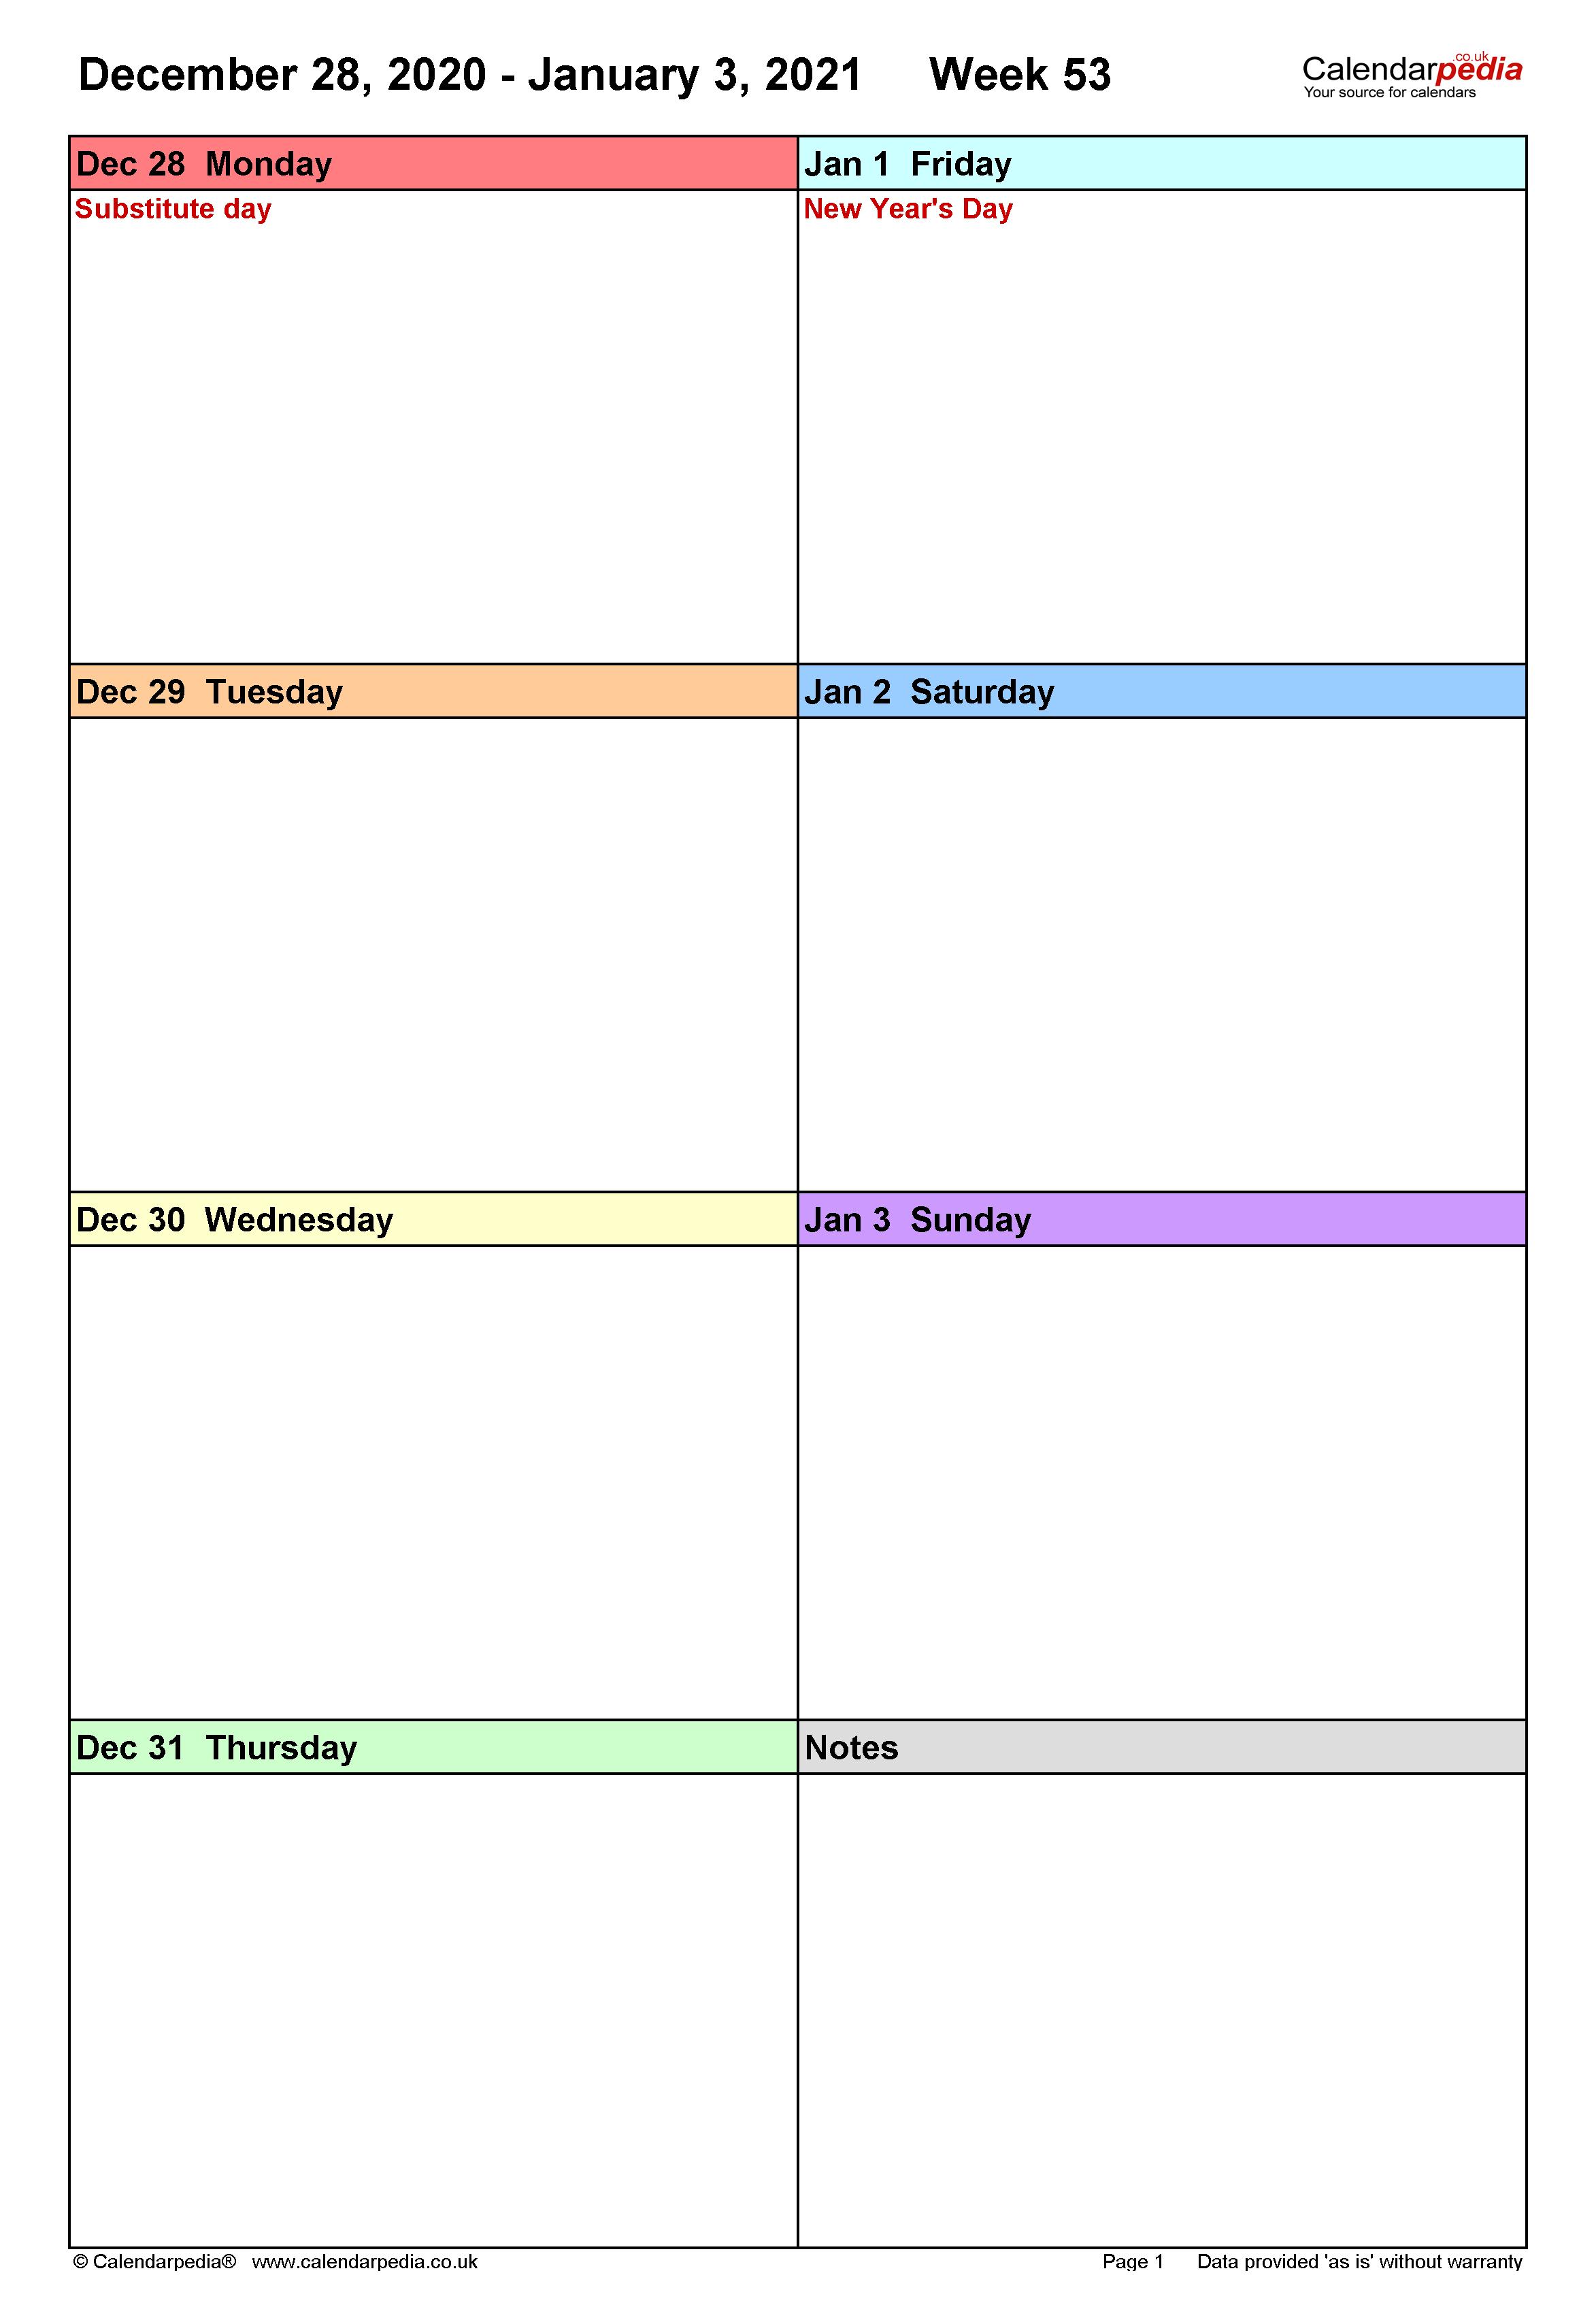 Weekly calendar 2021 UK - free printable templates for PDF